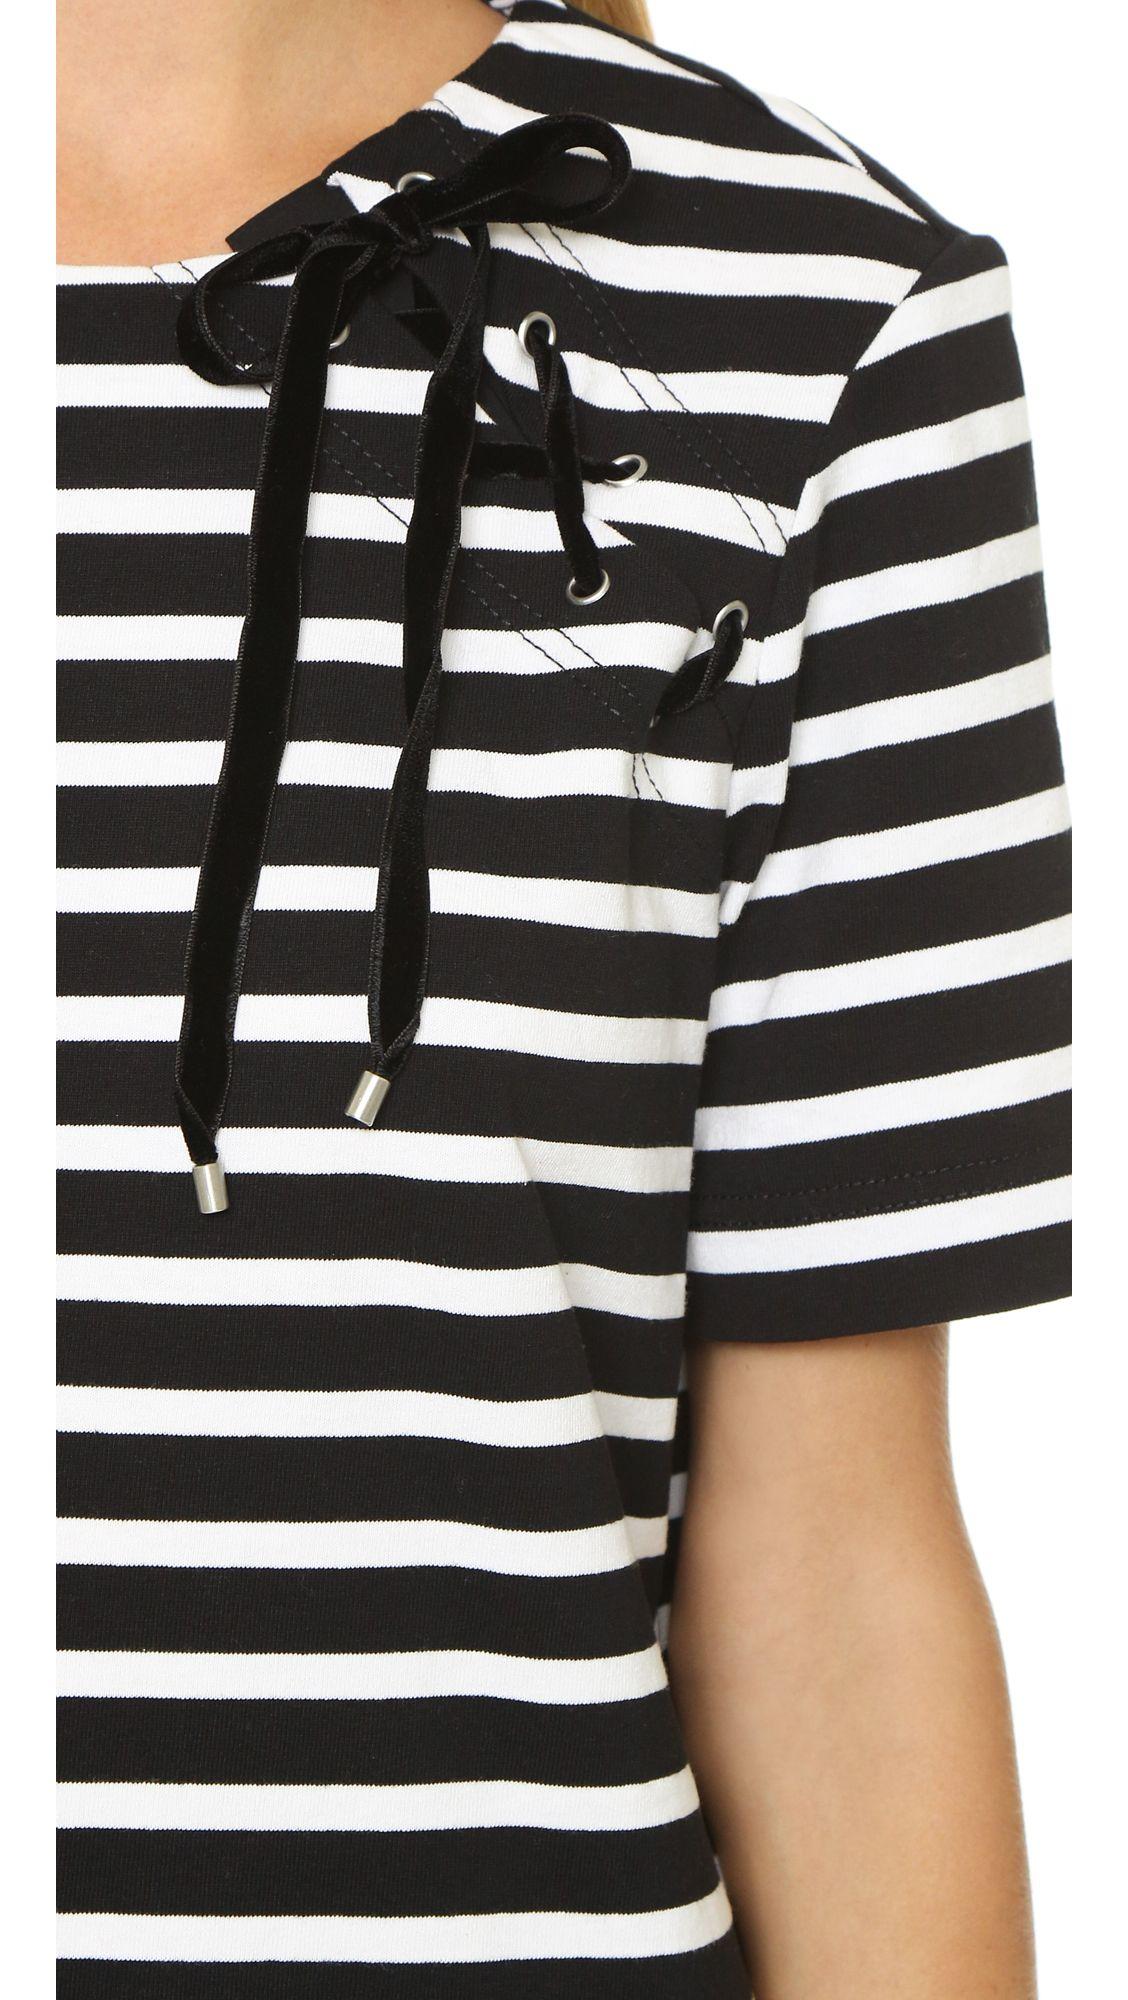 Marc by Marc Jacobs Jacquelyn Stripe Dress